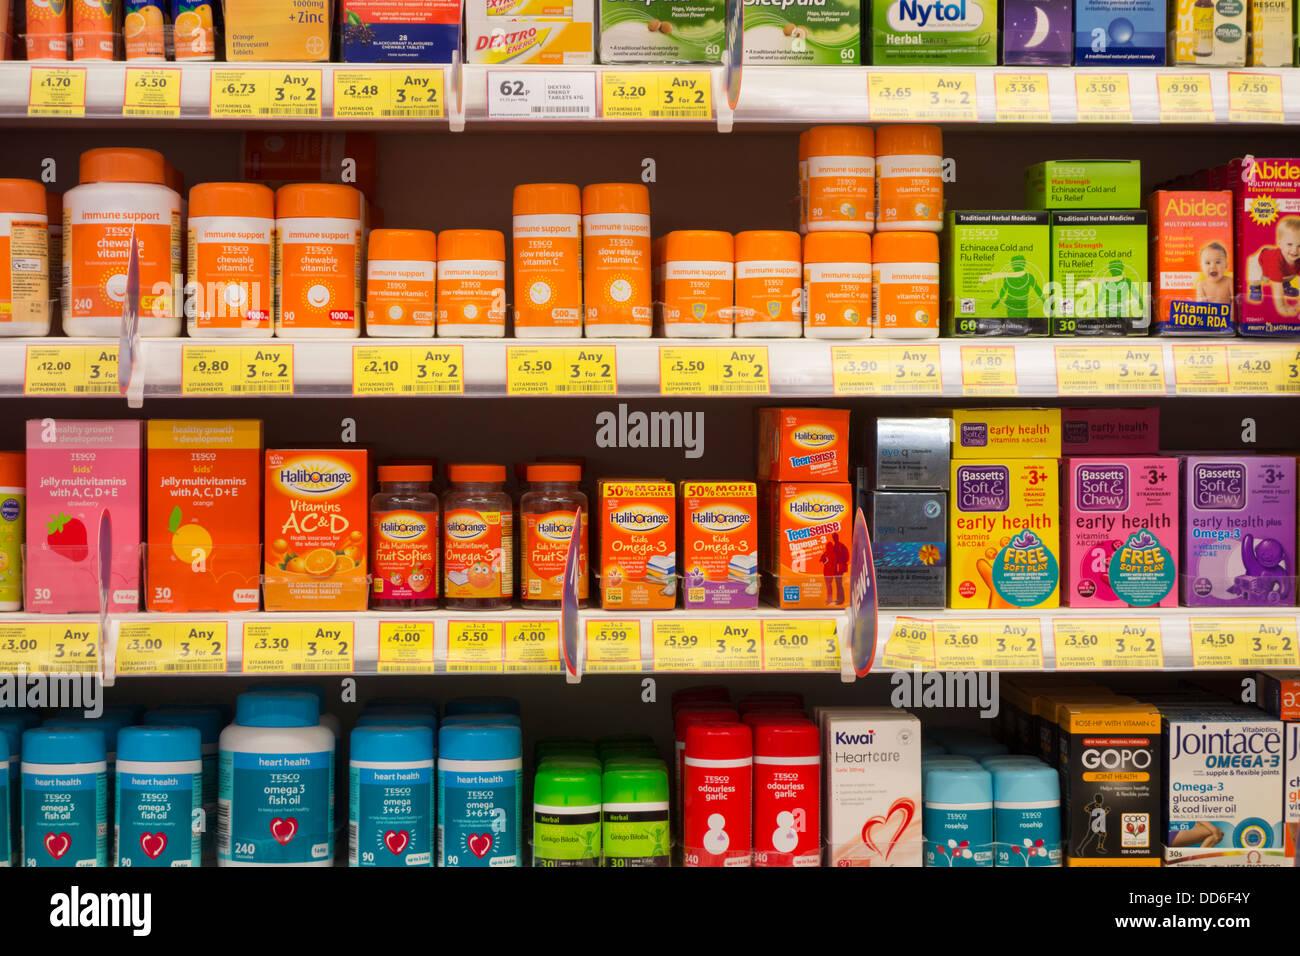 Vitamins display in Tesco supermarket - Stock Image